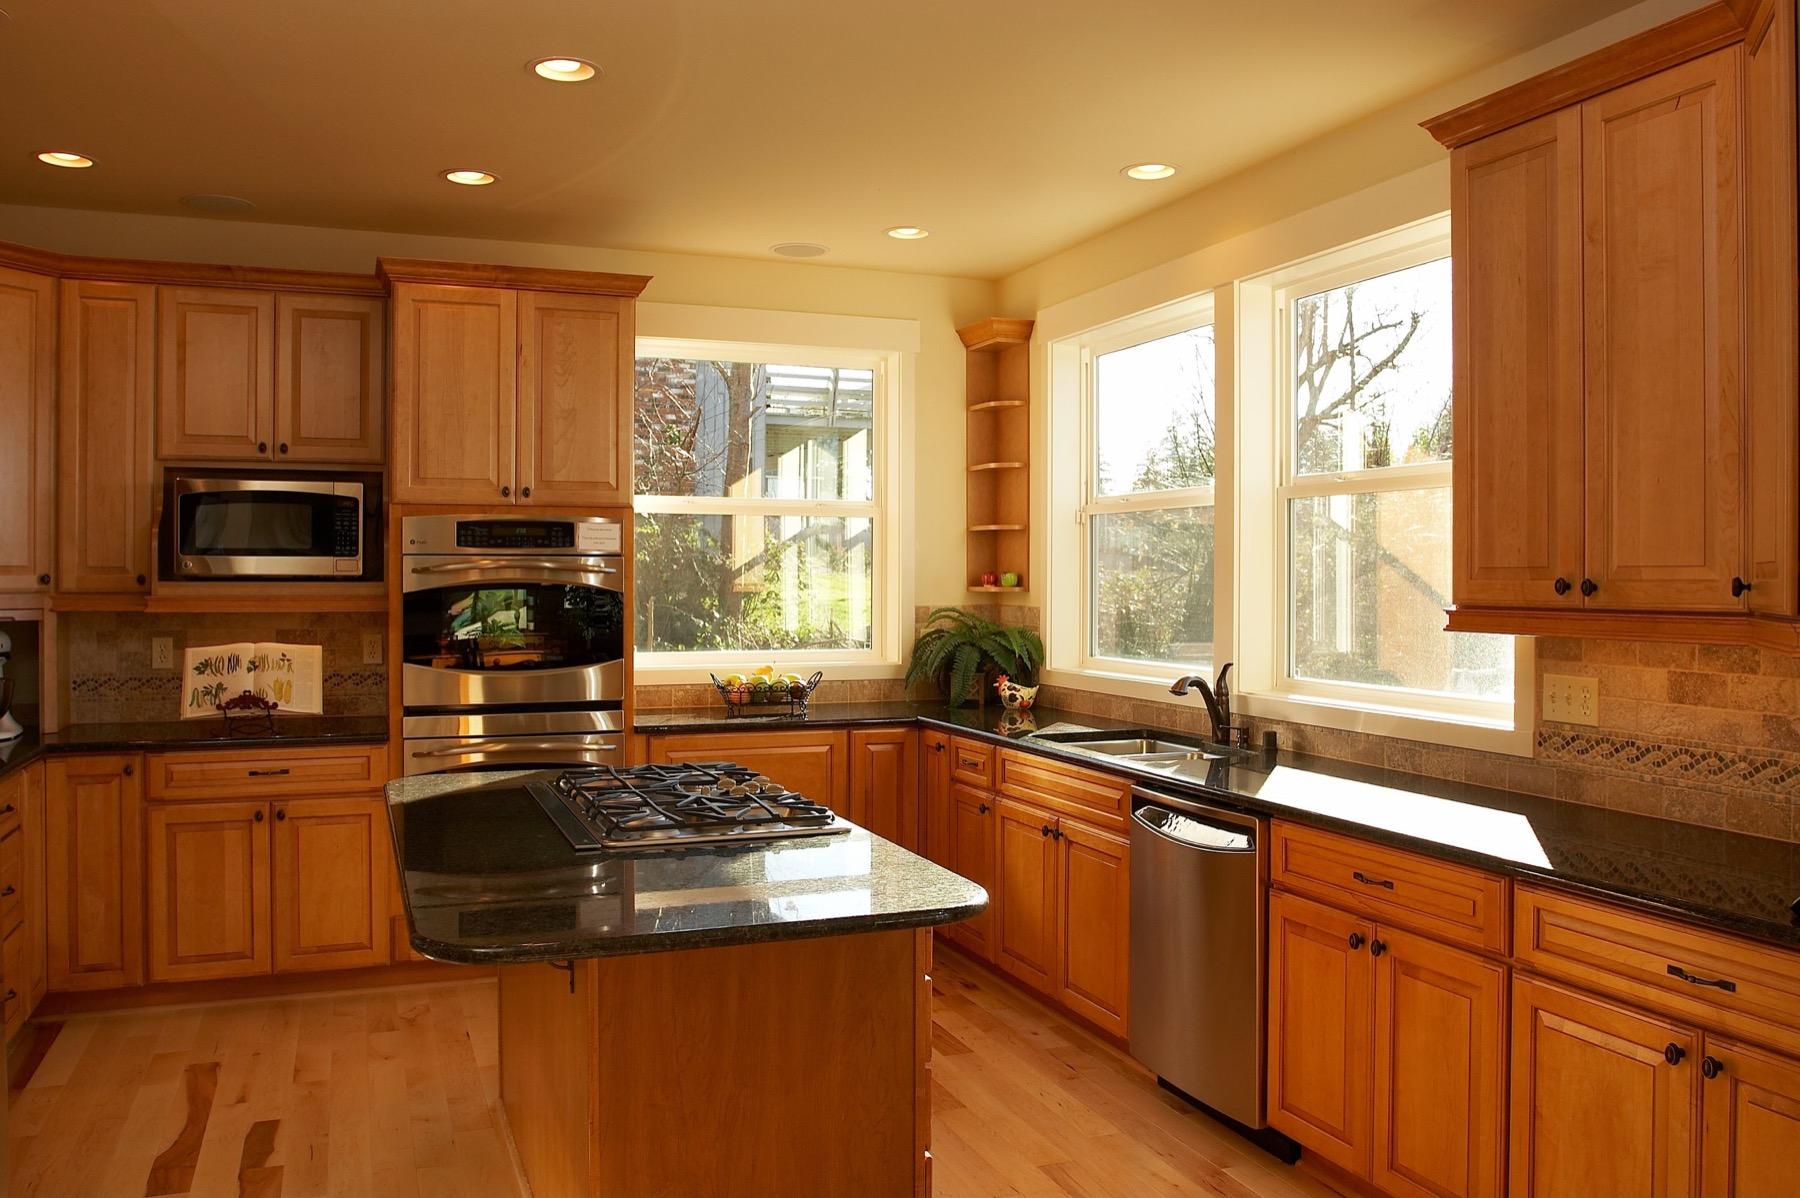 Kelley_Home_Services_Gig_Harbor_Home_Construction_2.jpg